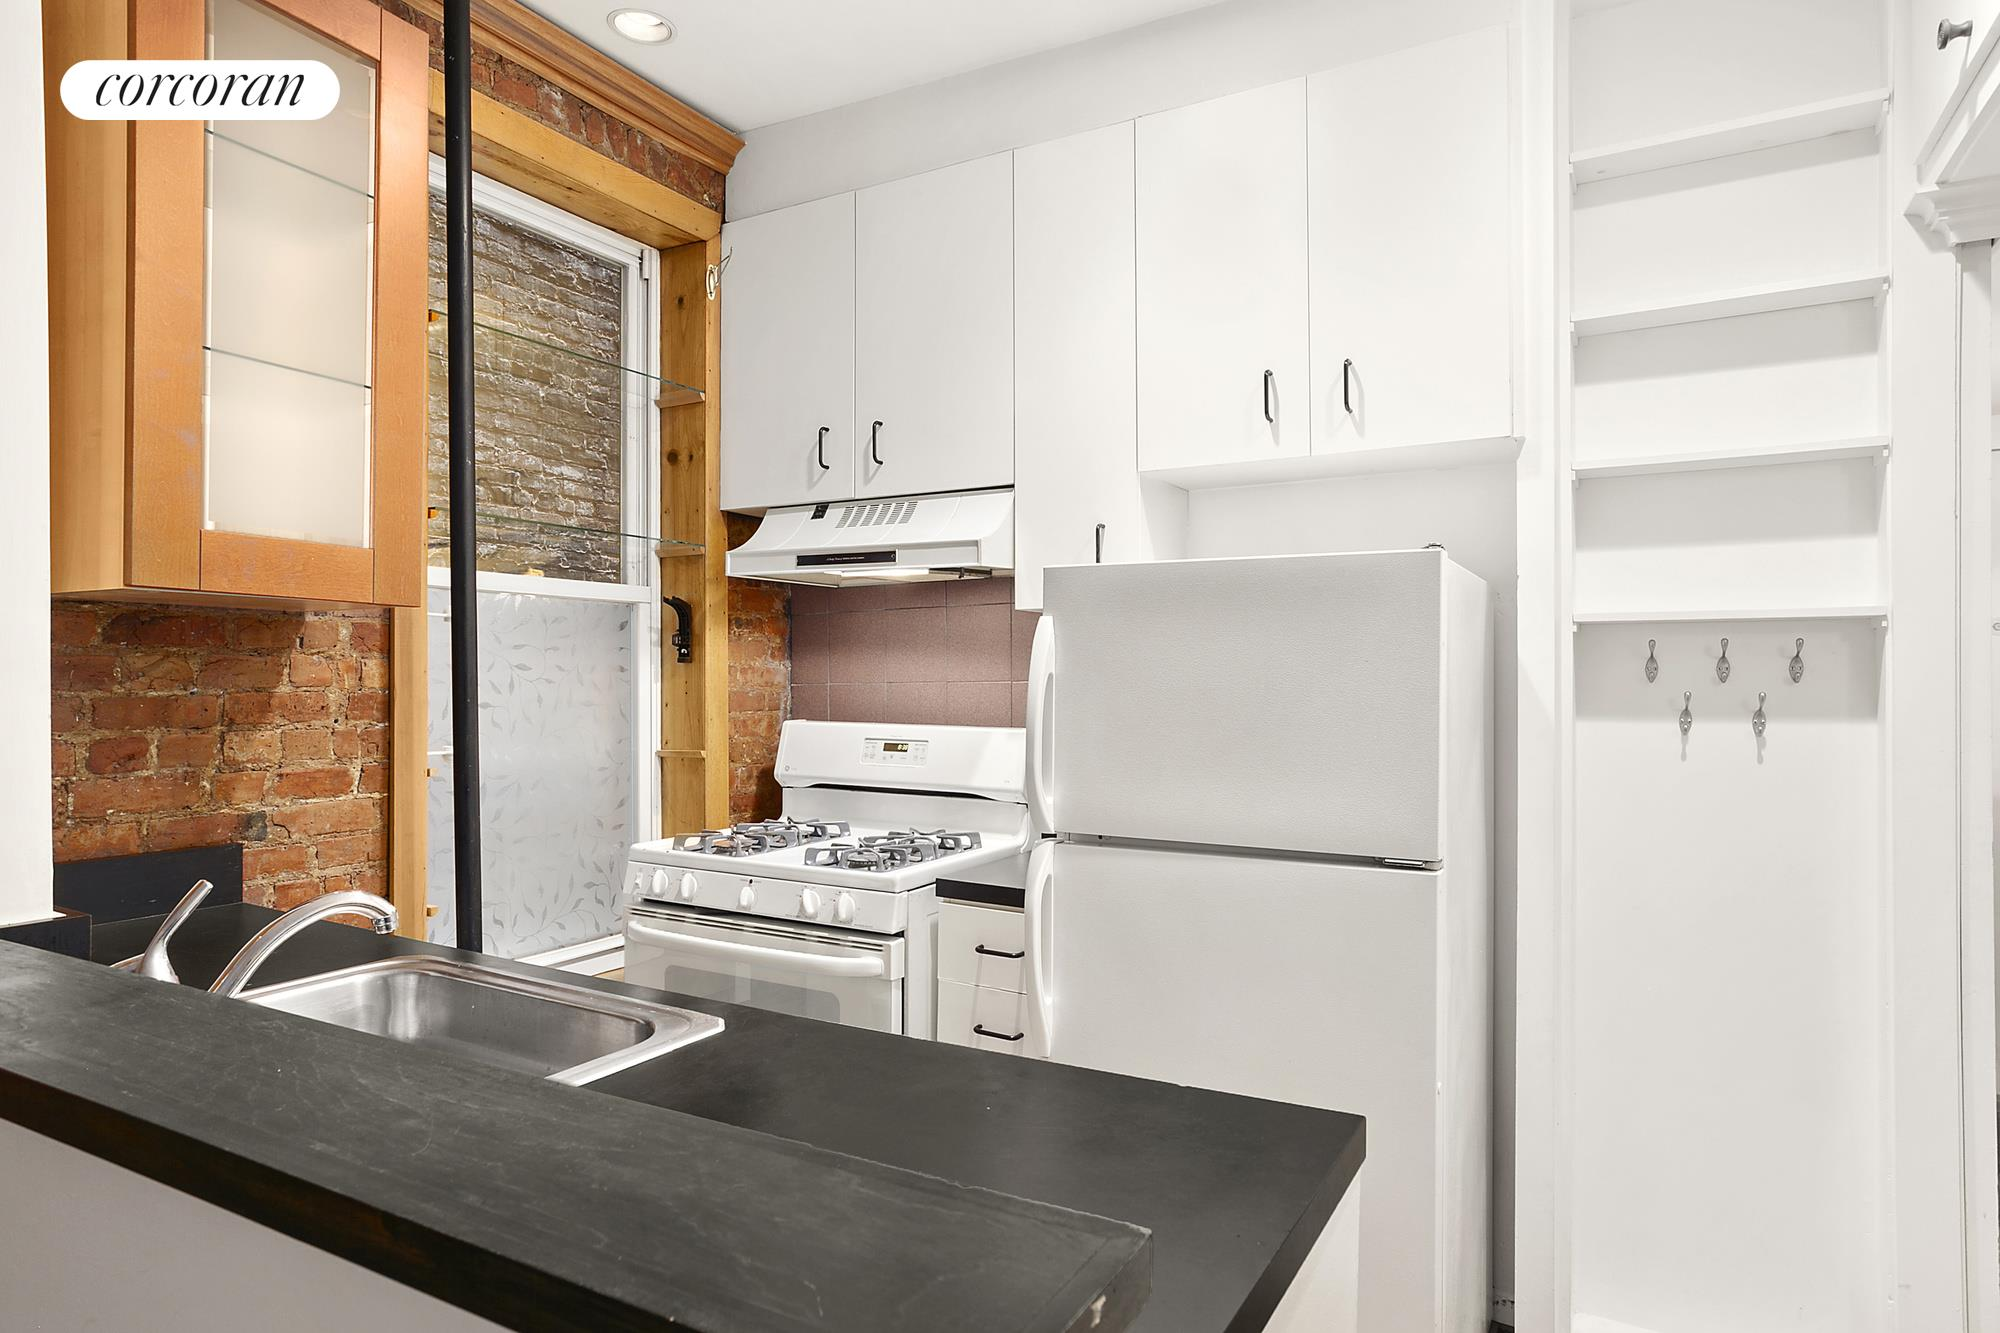 Corcoran, 45 Perry Street, Apt. 6, West Village Real Estate ...